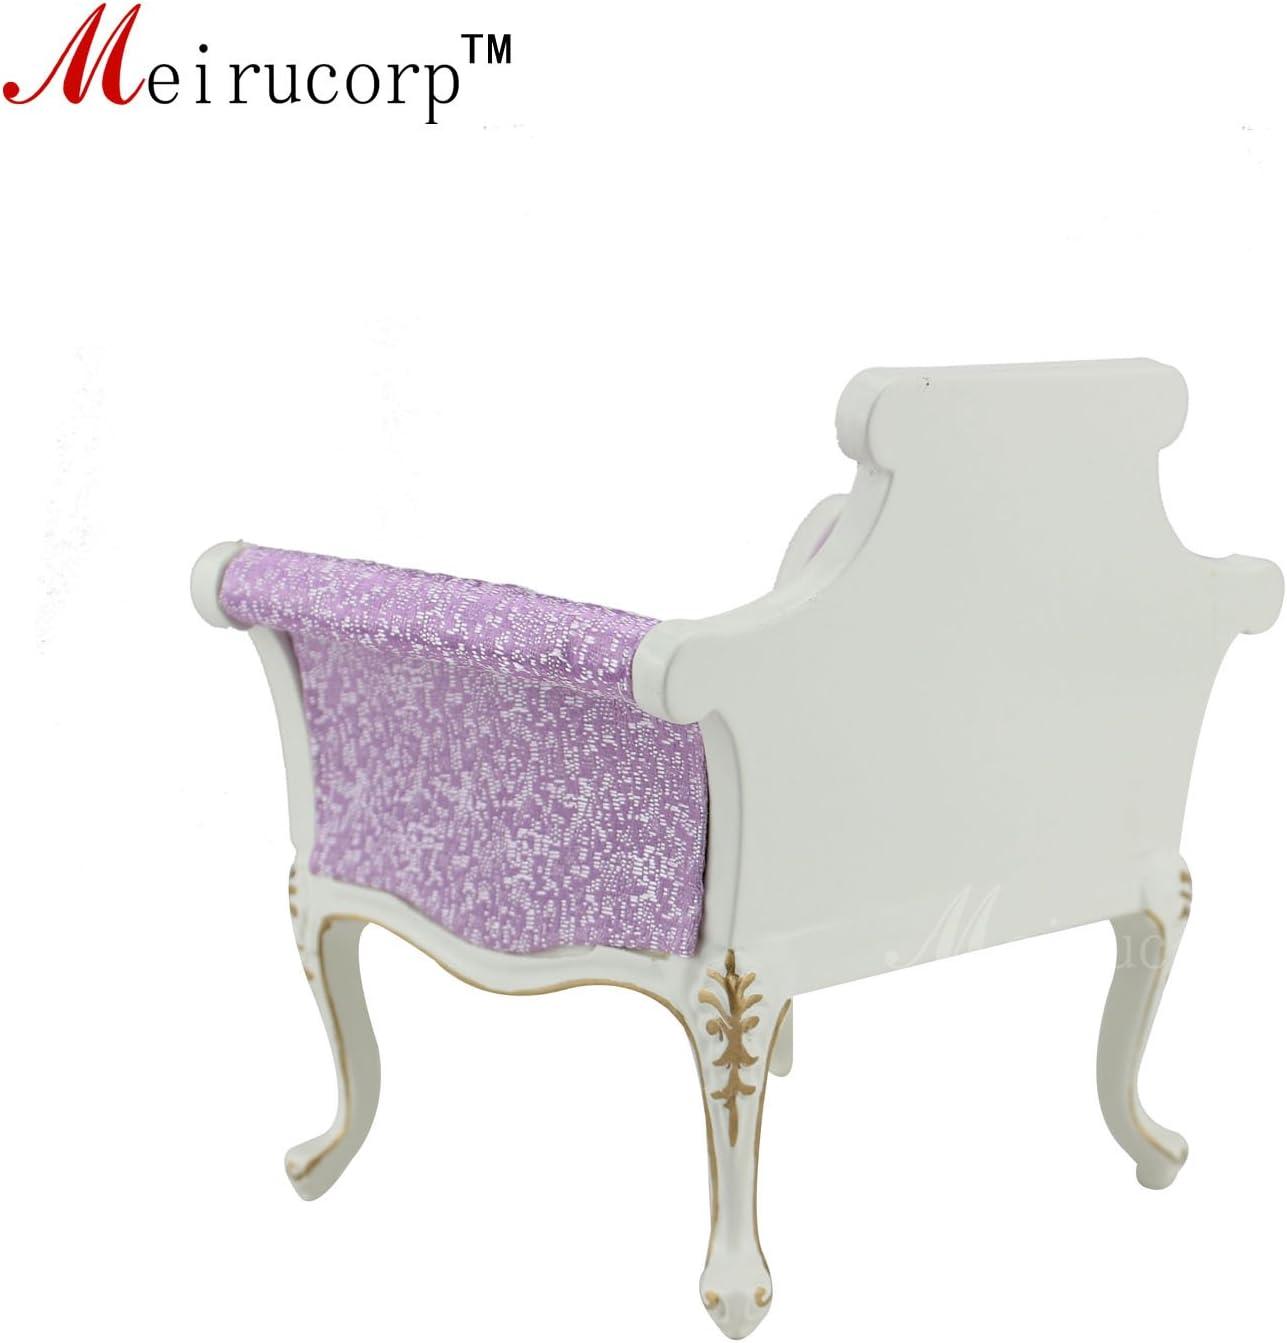 Doll Miniatues 1:6 scale Luxuriant furniture Handmade Gilt Armchair